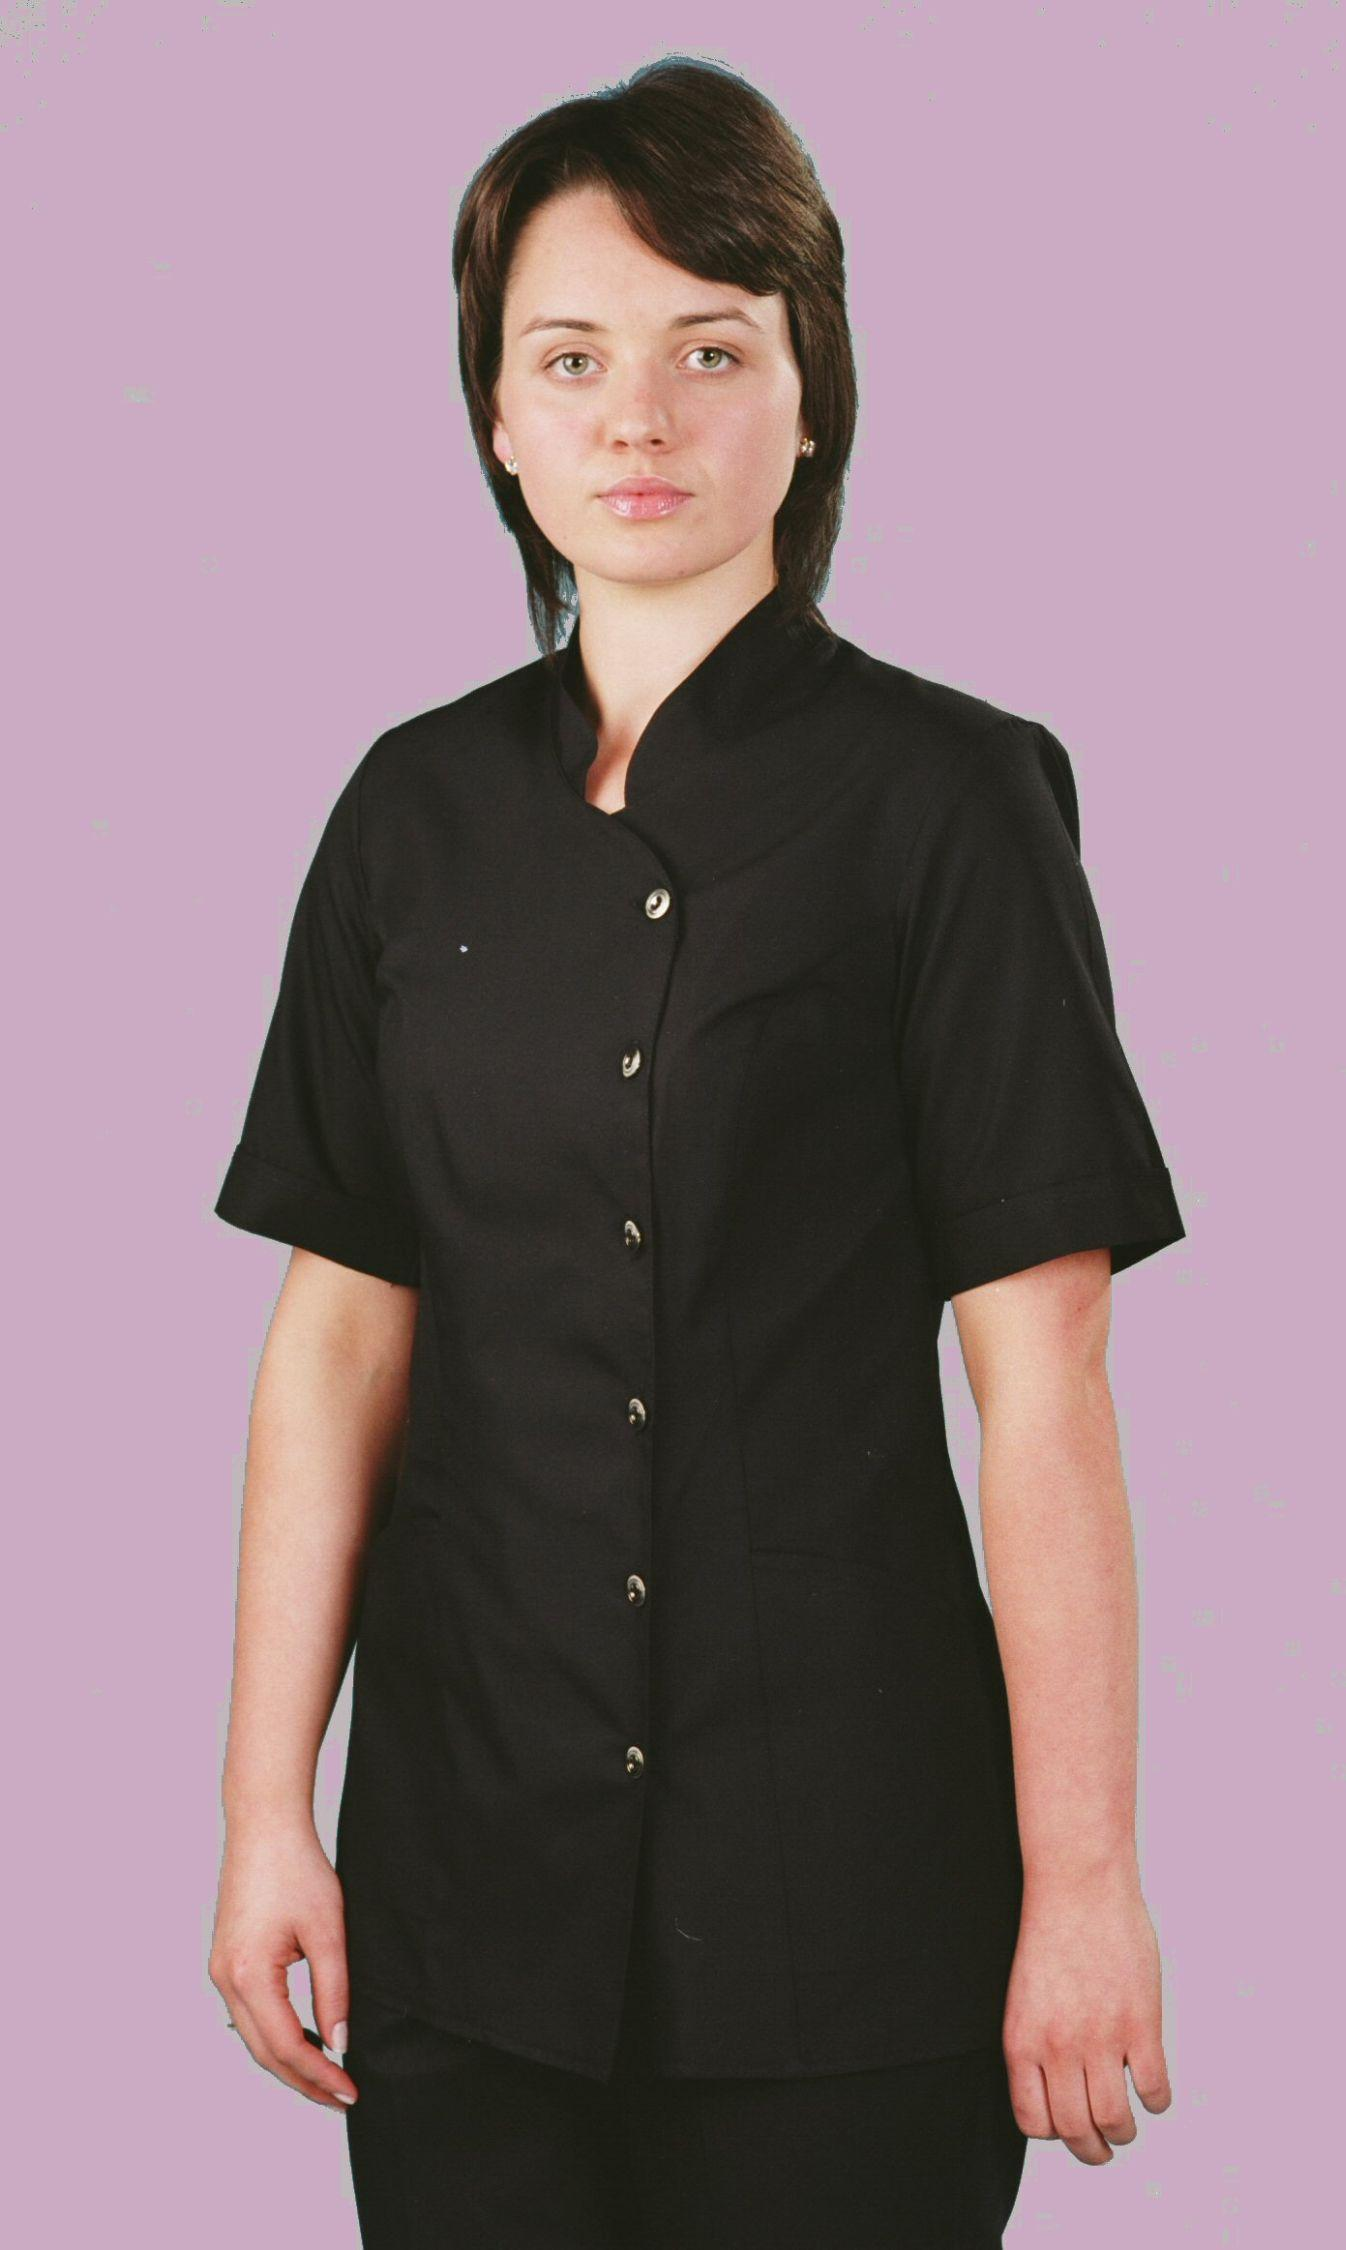 a83f5669a67 Jenna - mandarin collar Tunic (BT360h) - Coppingers - Uniform ...